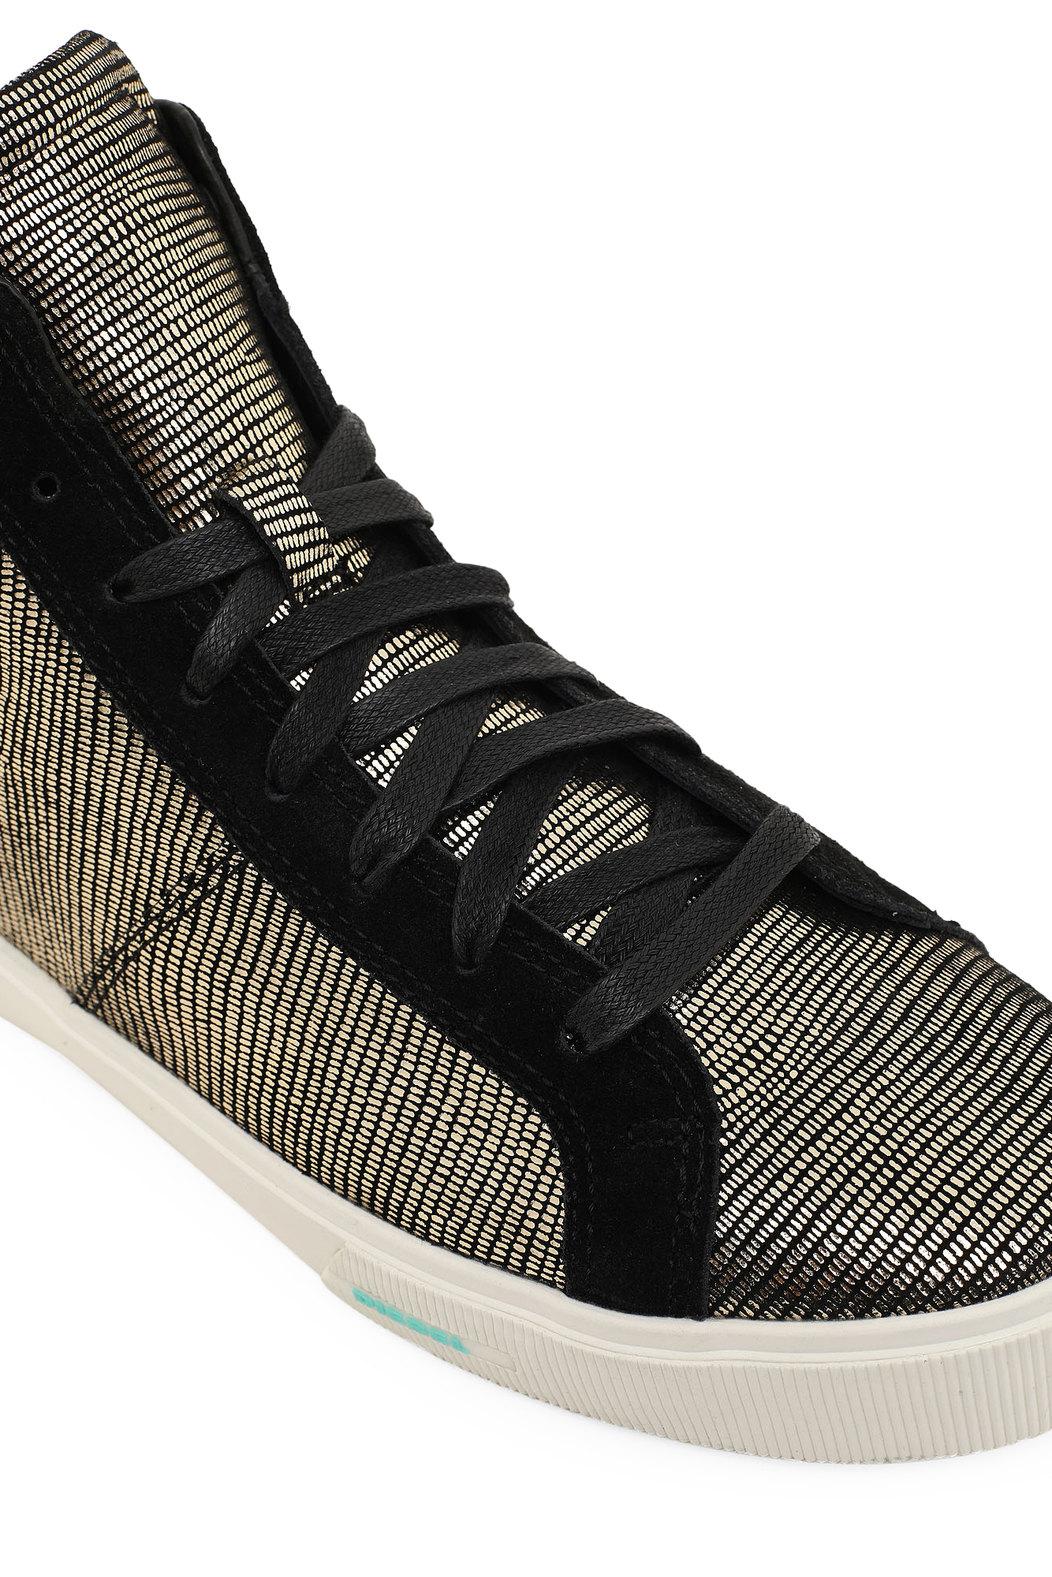 High-top sneakers with metallic motif